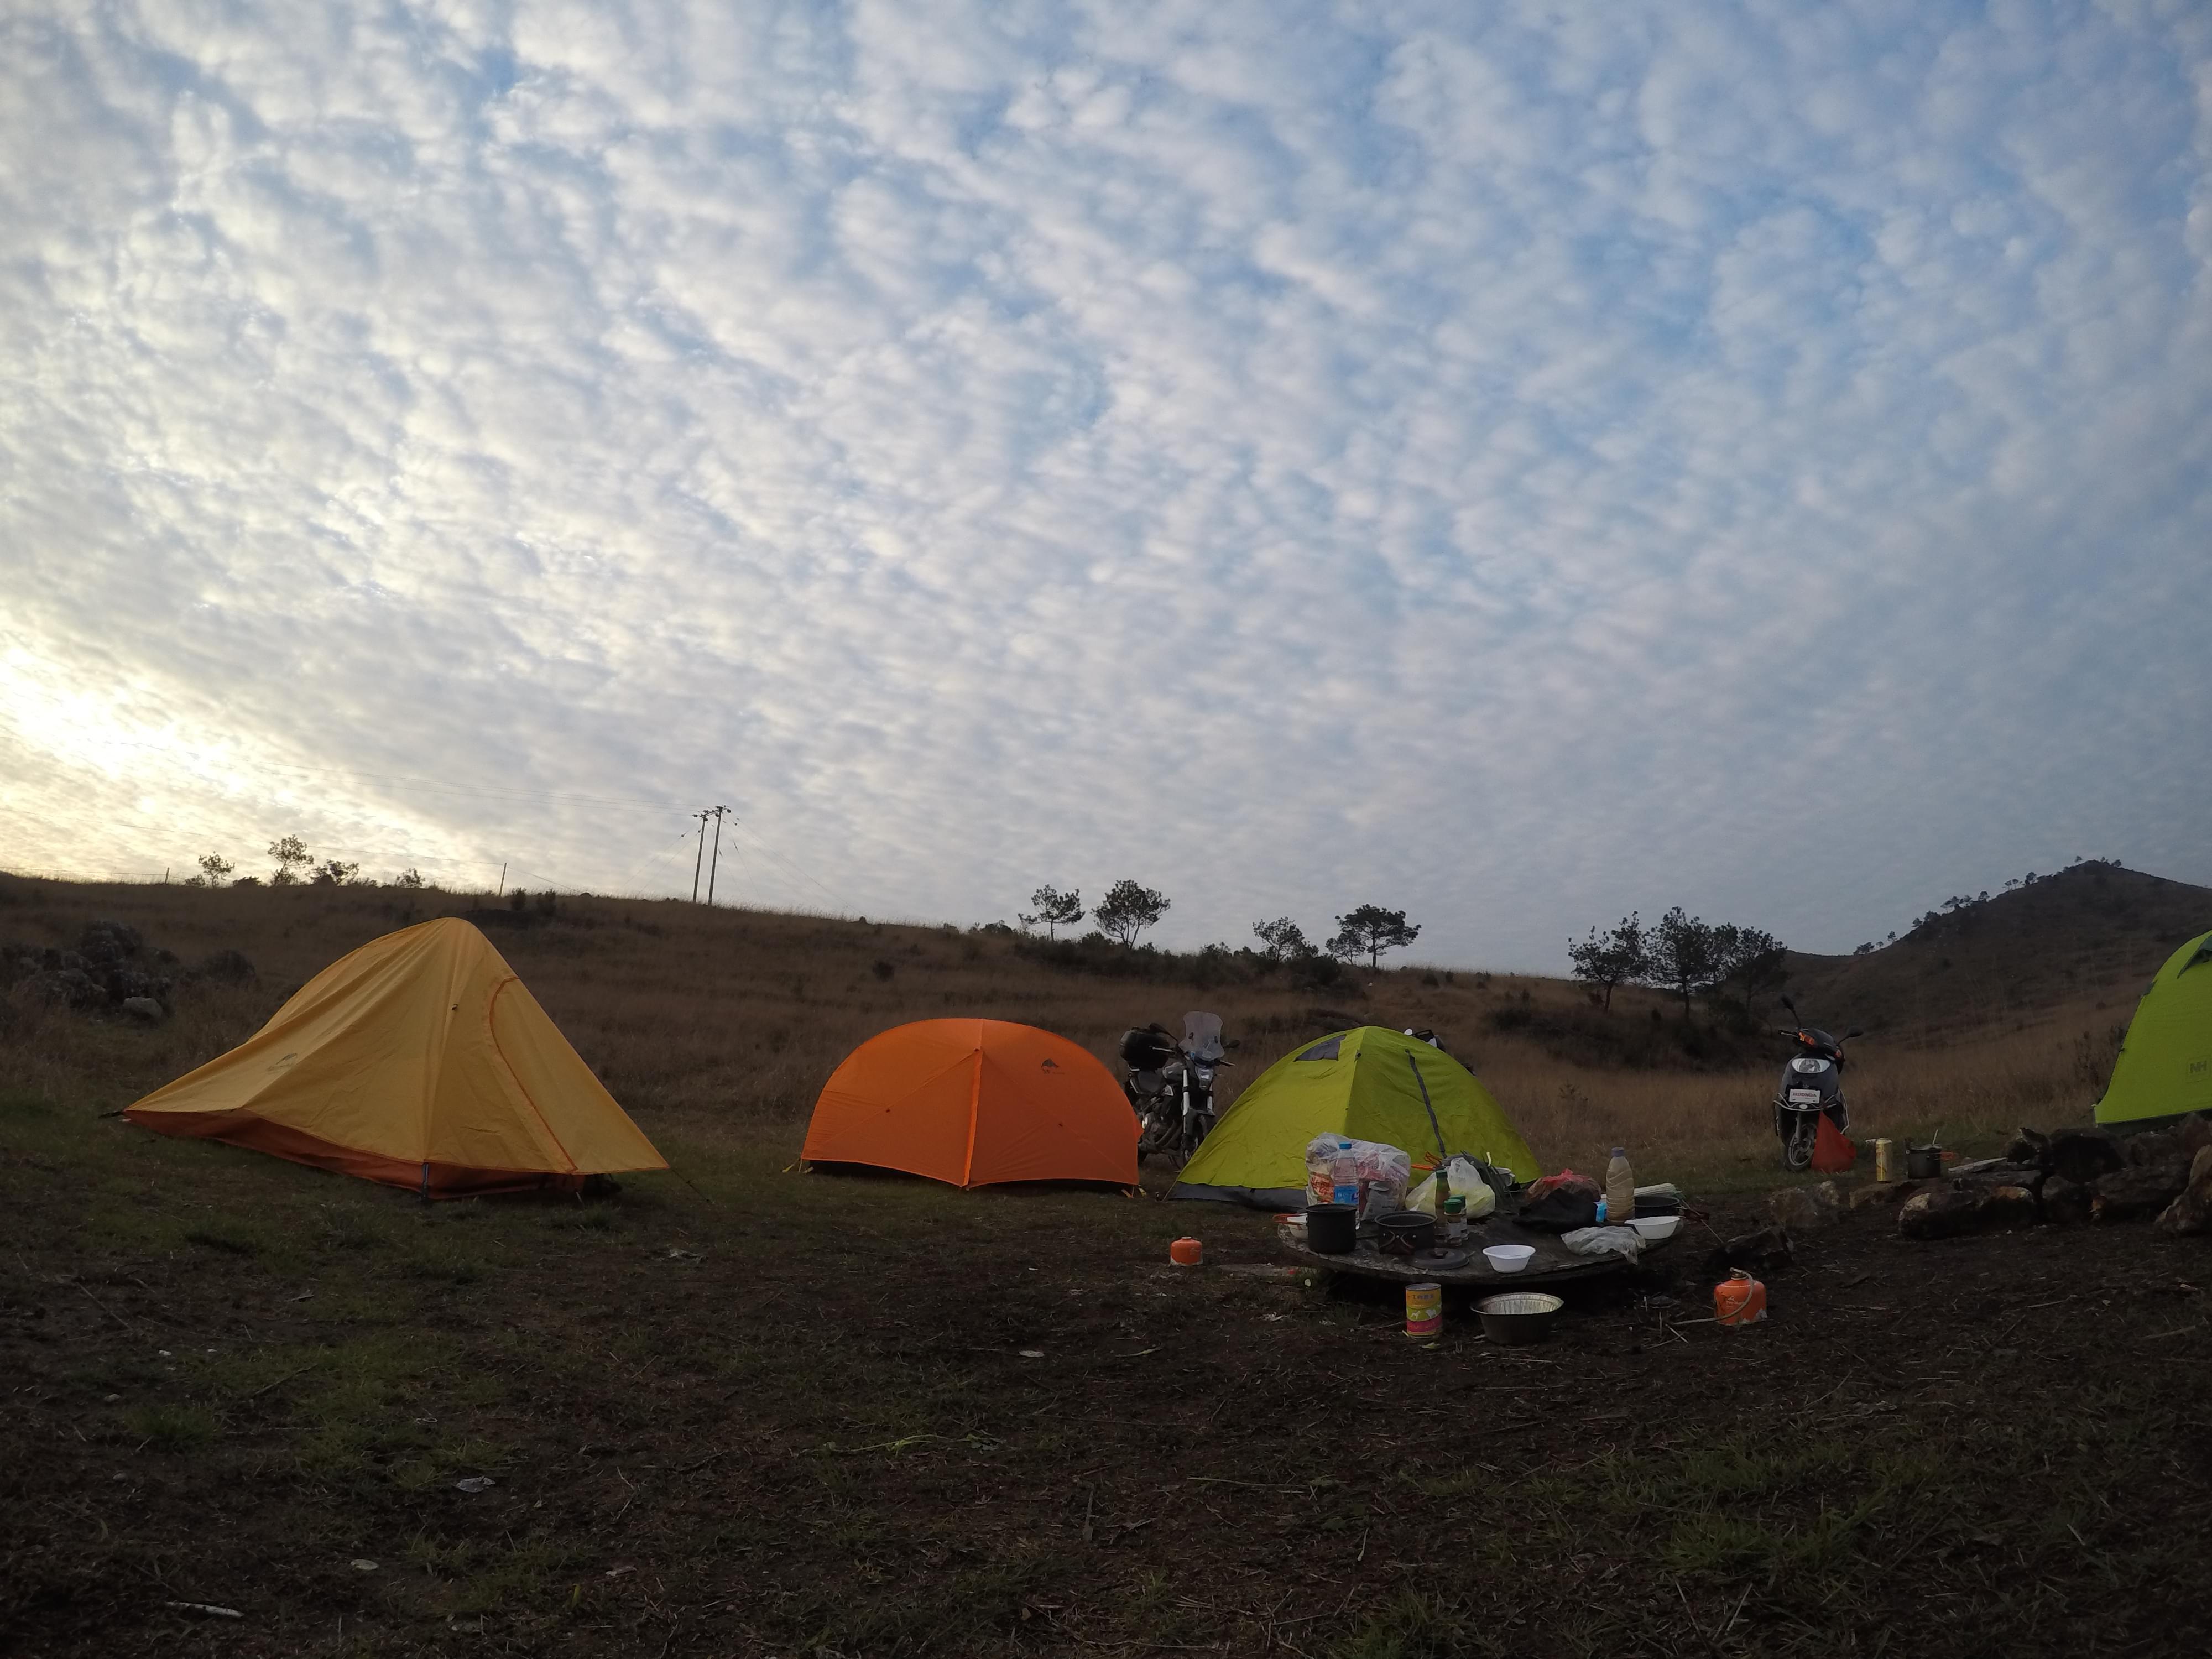 杉洋白溪草场露营